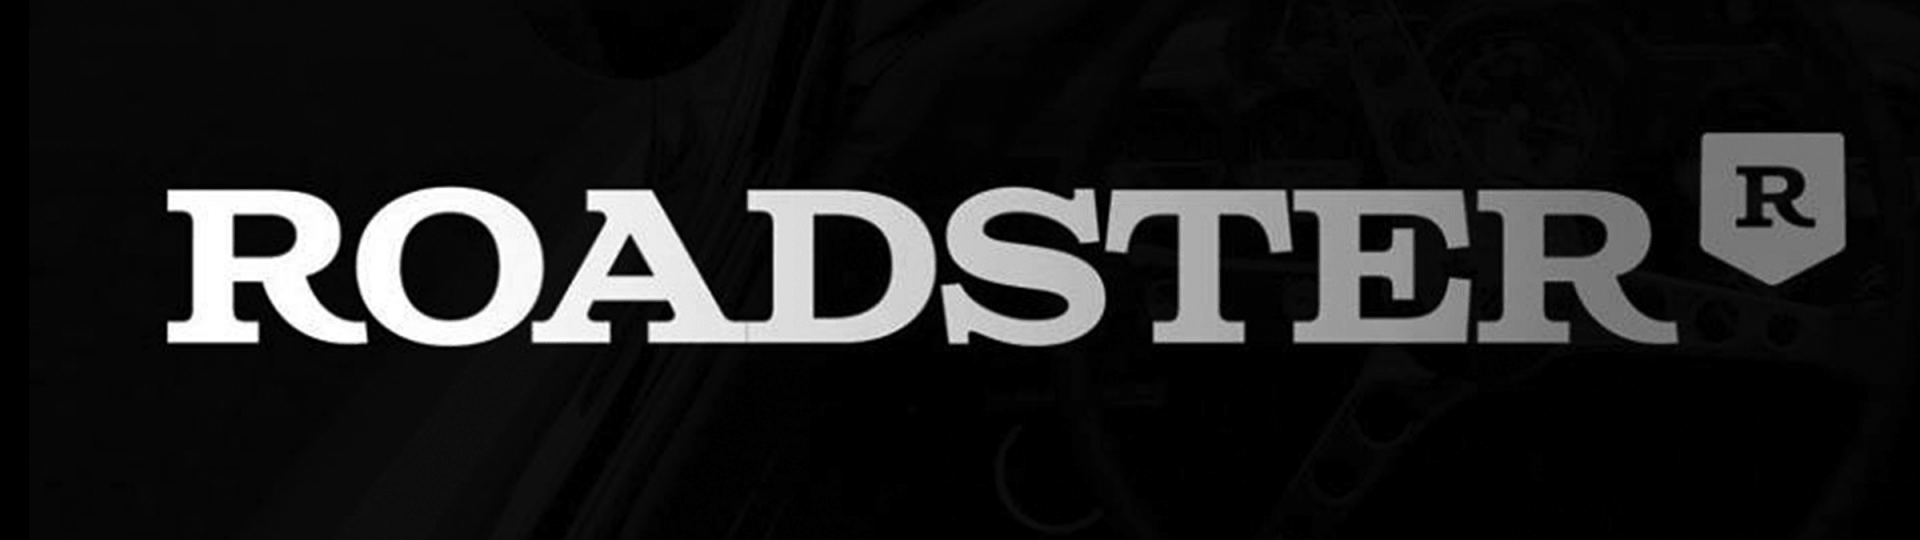 roadster- logo